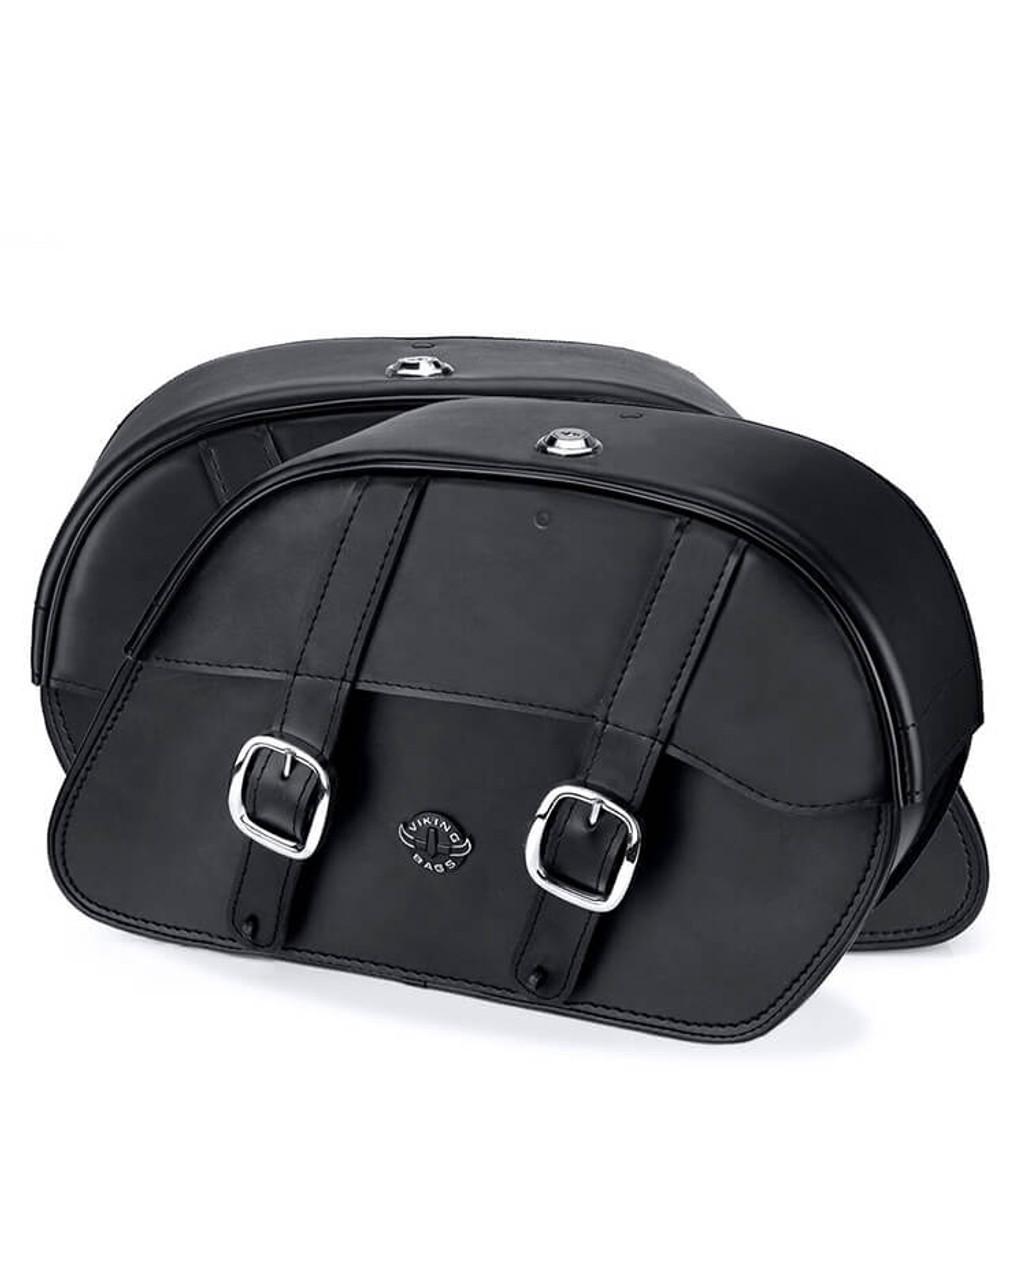 Victory High Ball Charger Slanted Medium Motorcycle Saddlebags both bags view